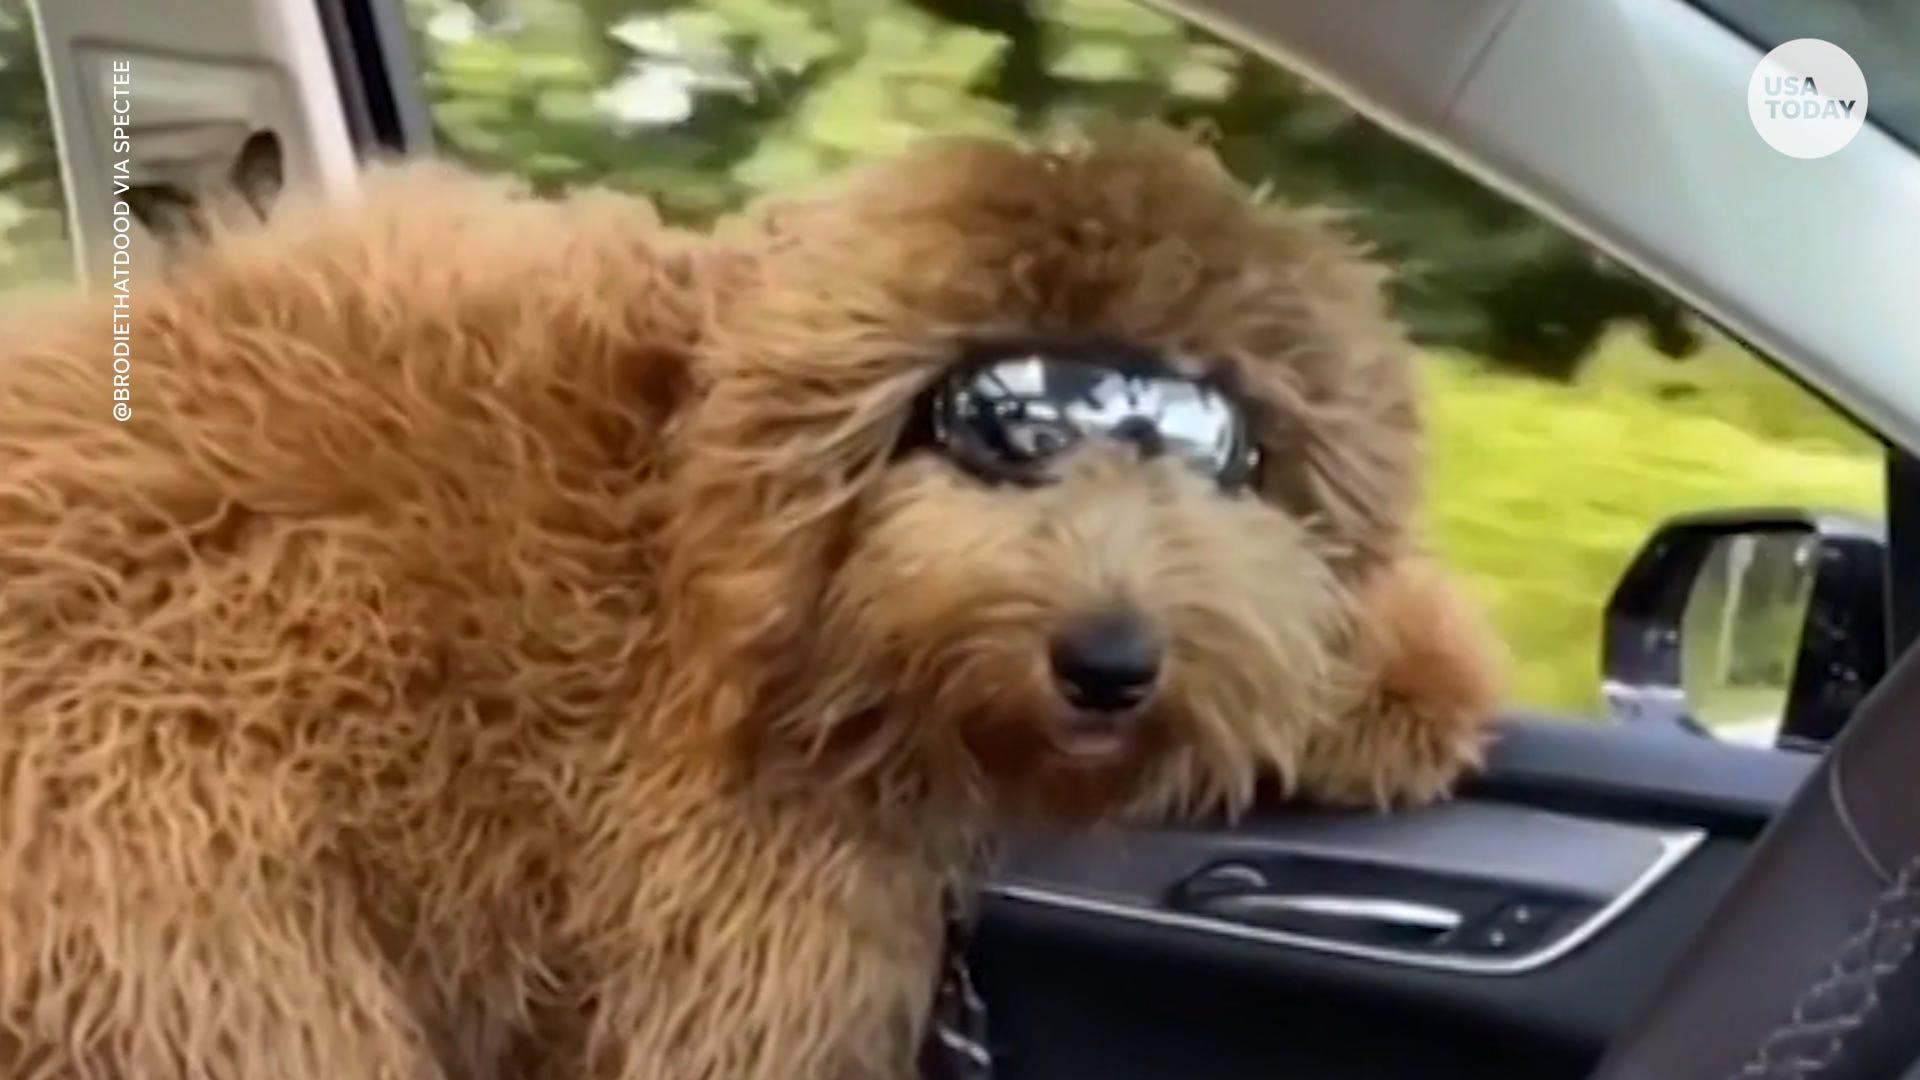 Fluffy dog loves feeling the wind through his hair on car rides